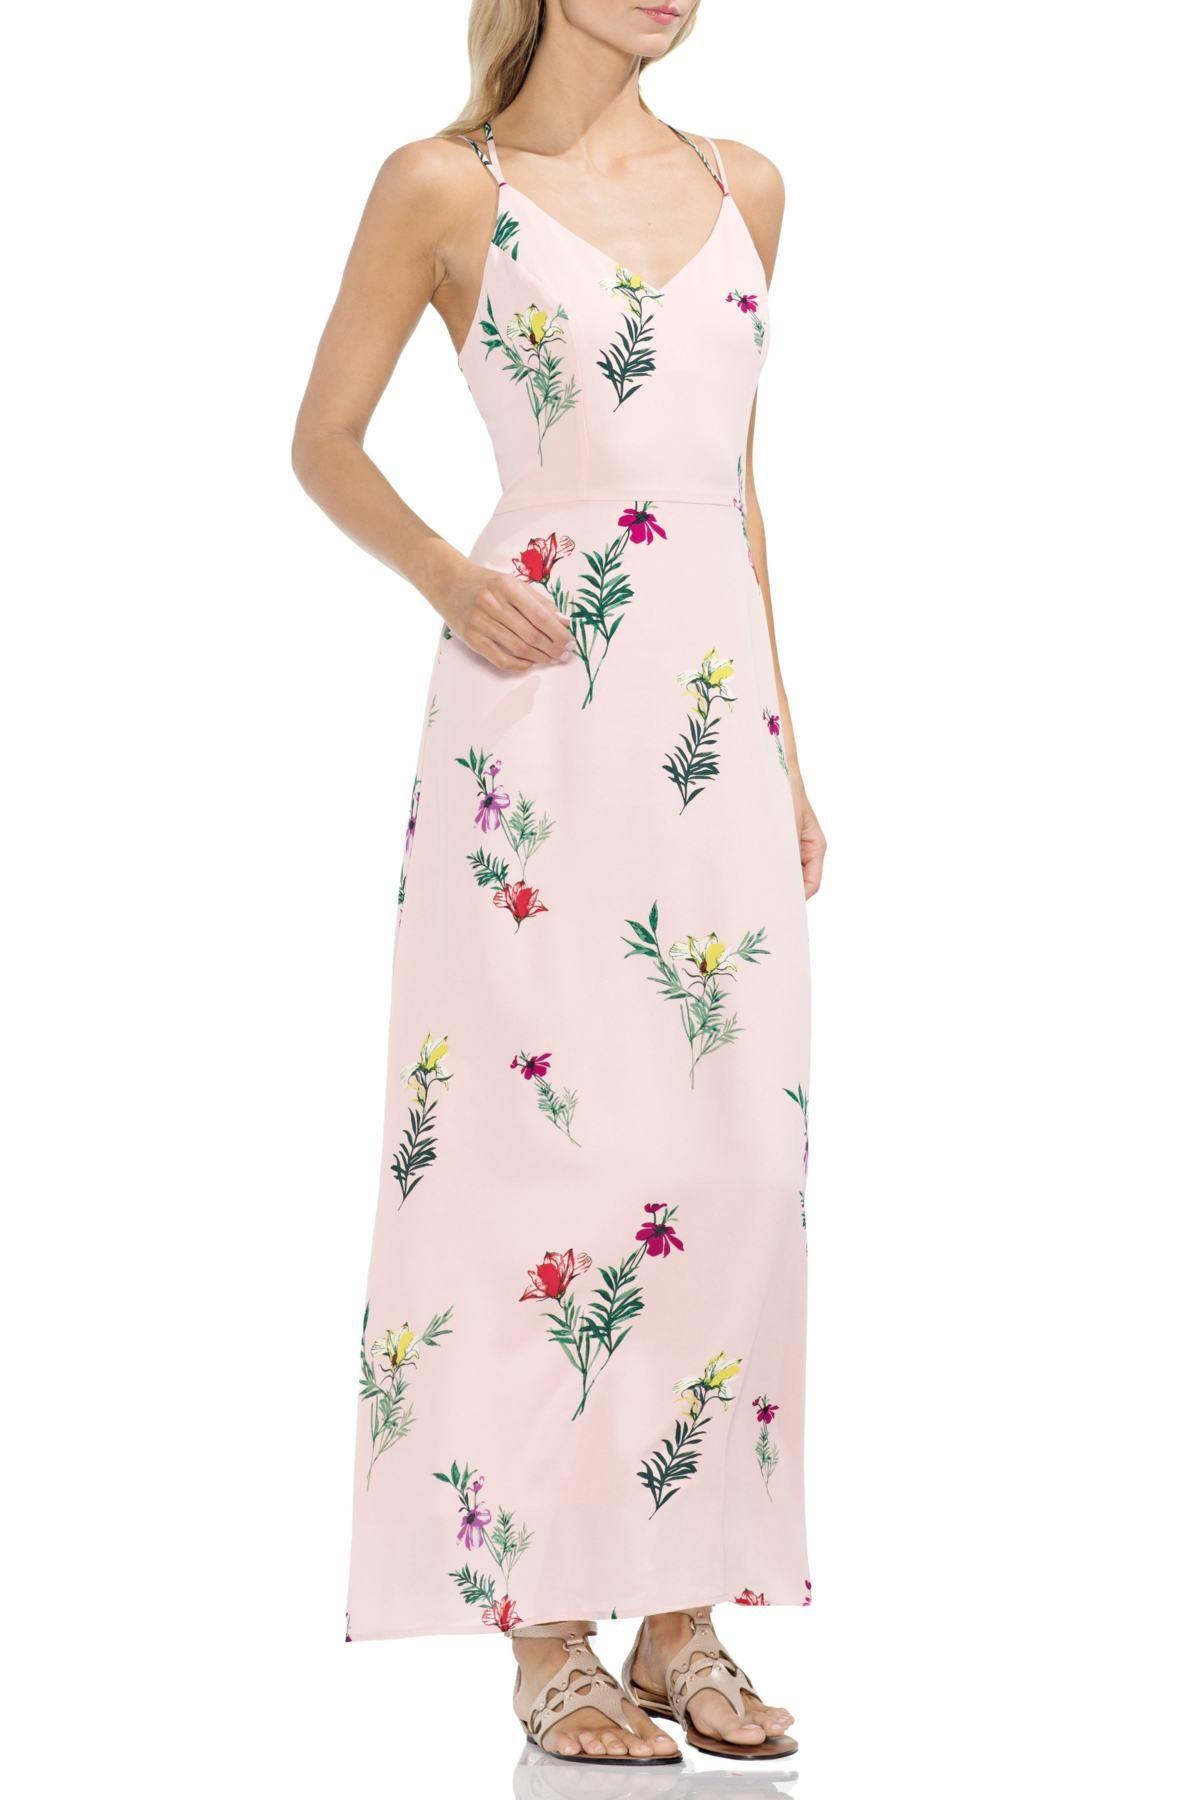 711f6b4ac74 Tropical Garden Maxi Dress | Products | Floral print maxi dress ...